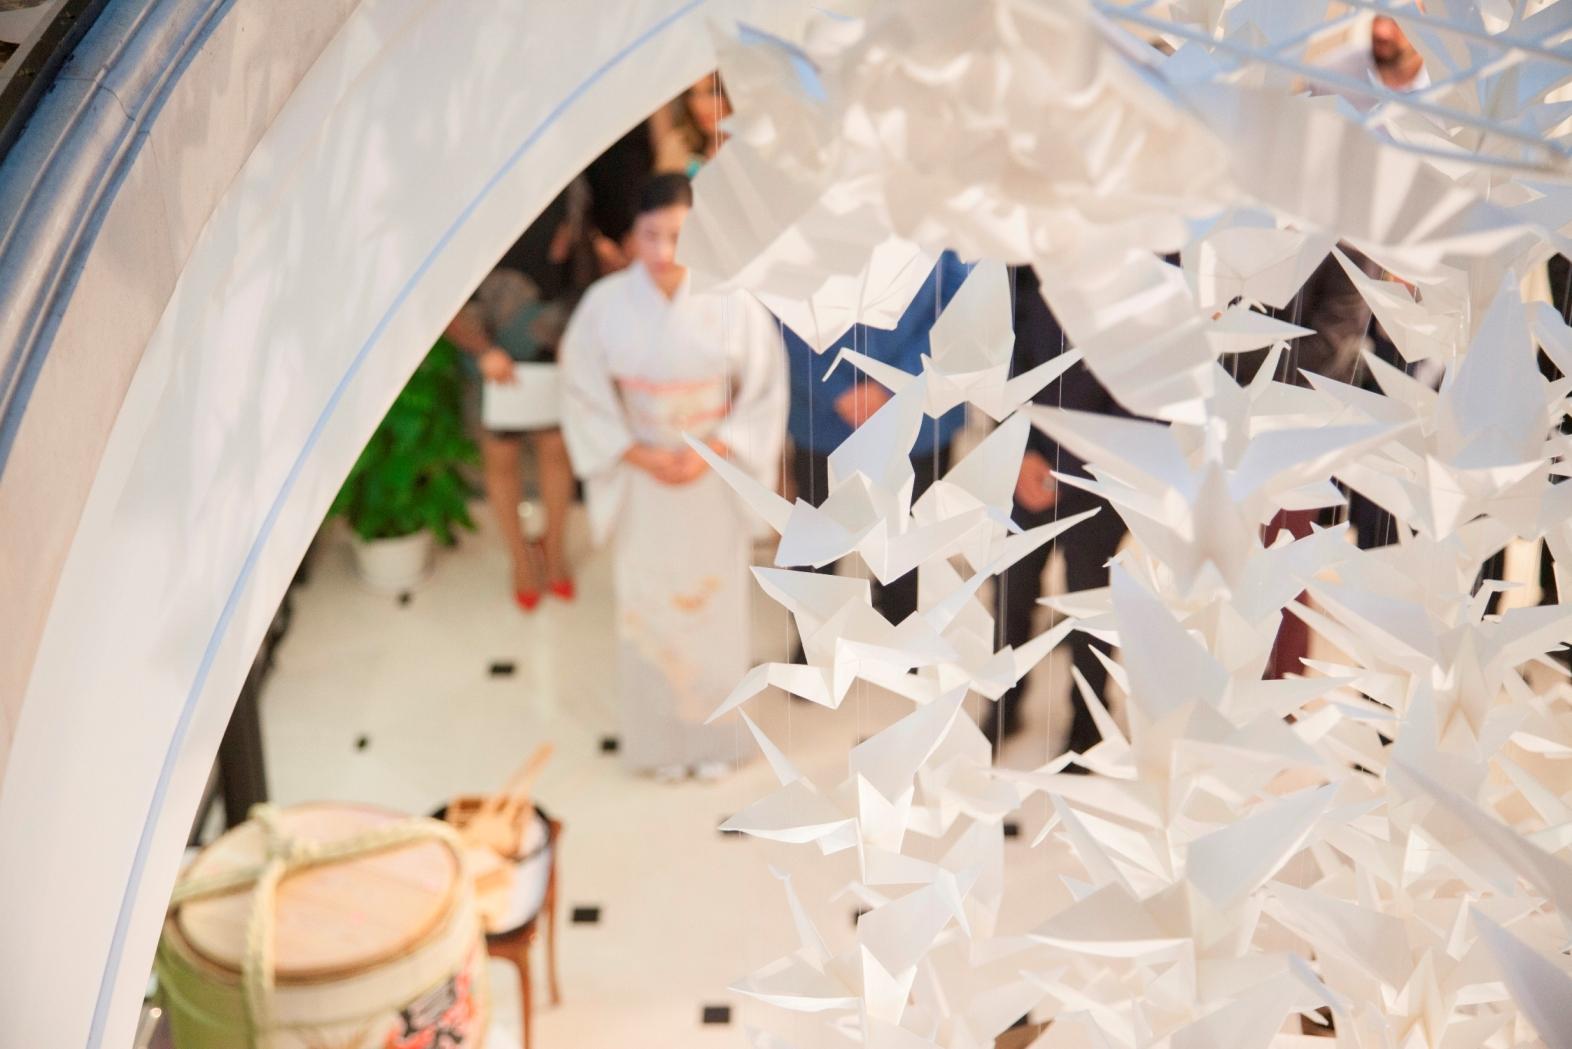 Origami_empaperart_cultura japonesa